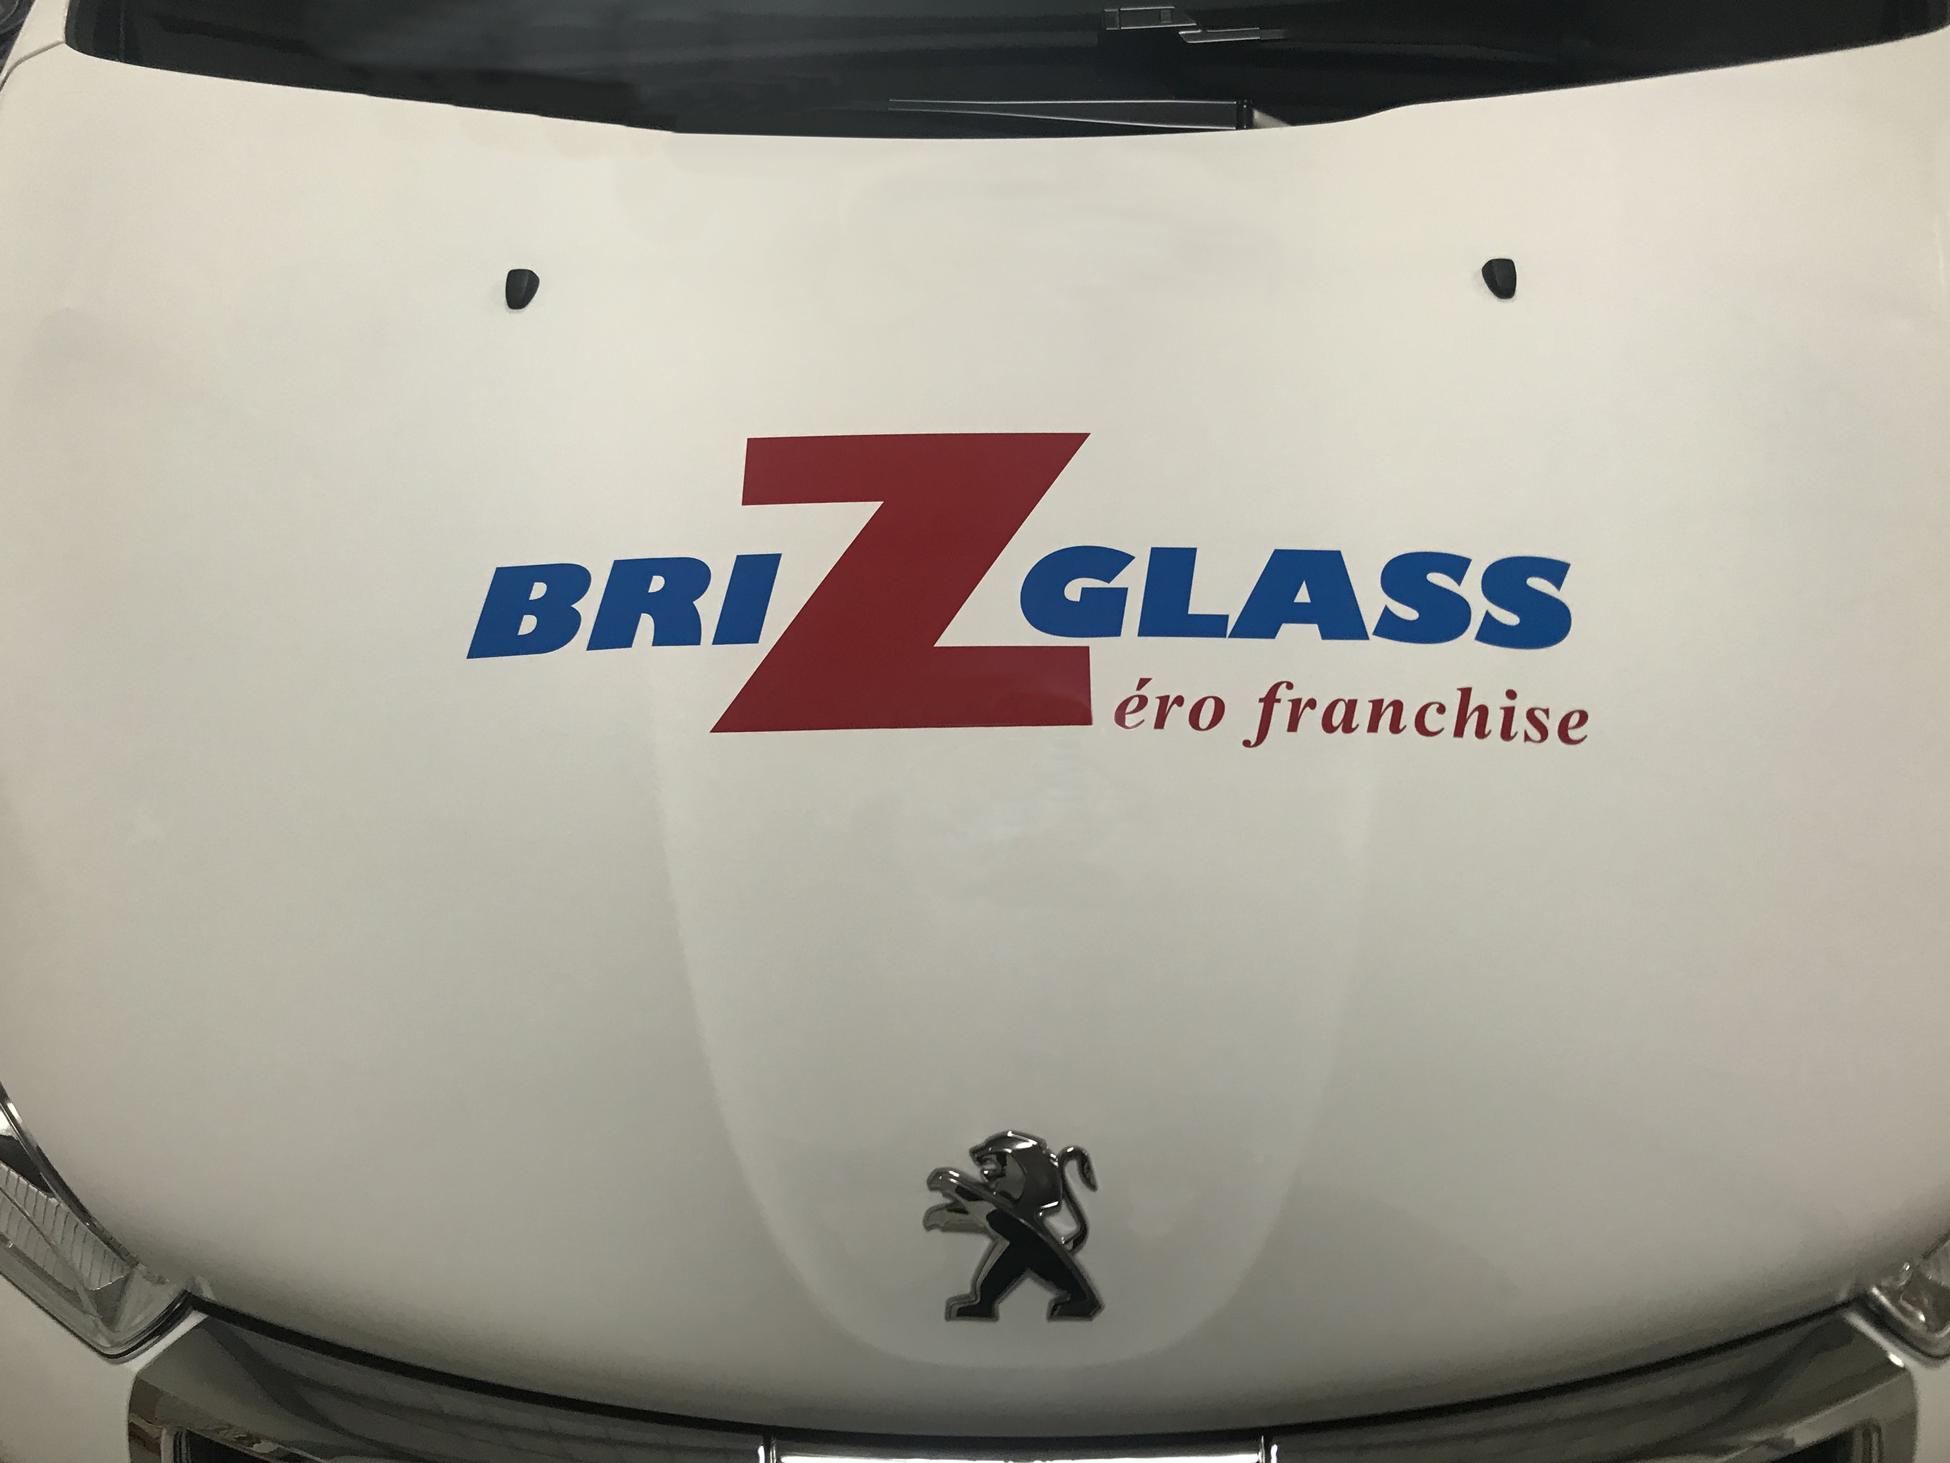 brizGlass